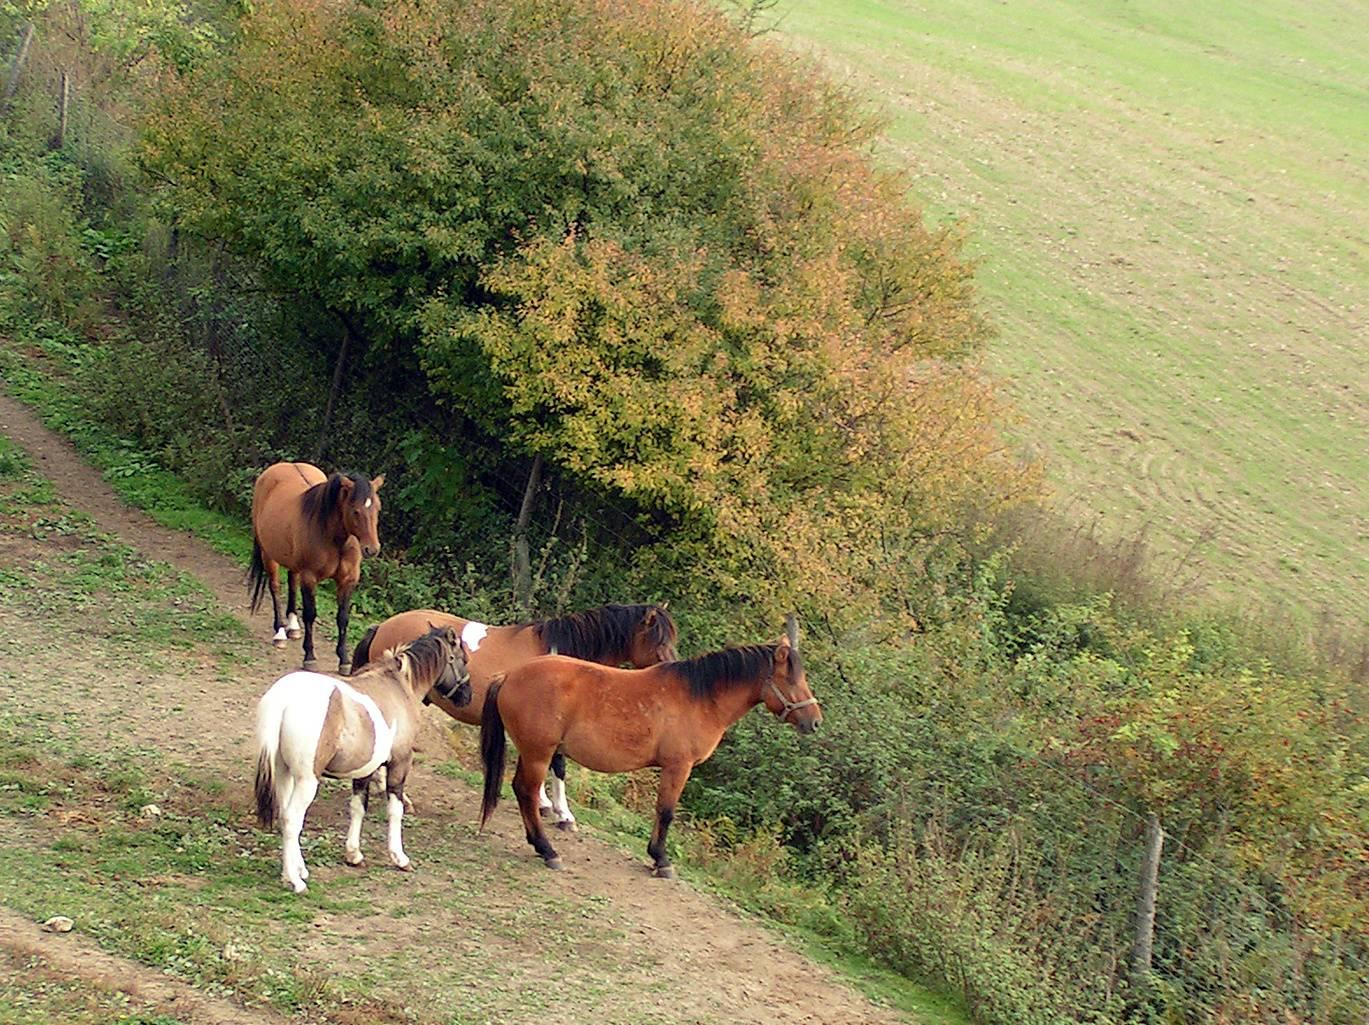 Konie -horses